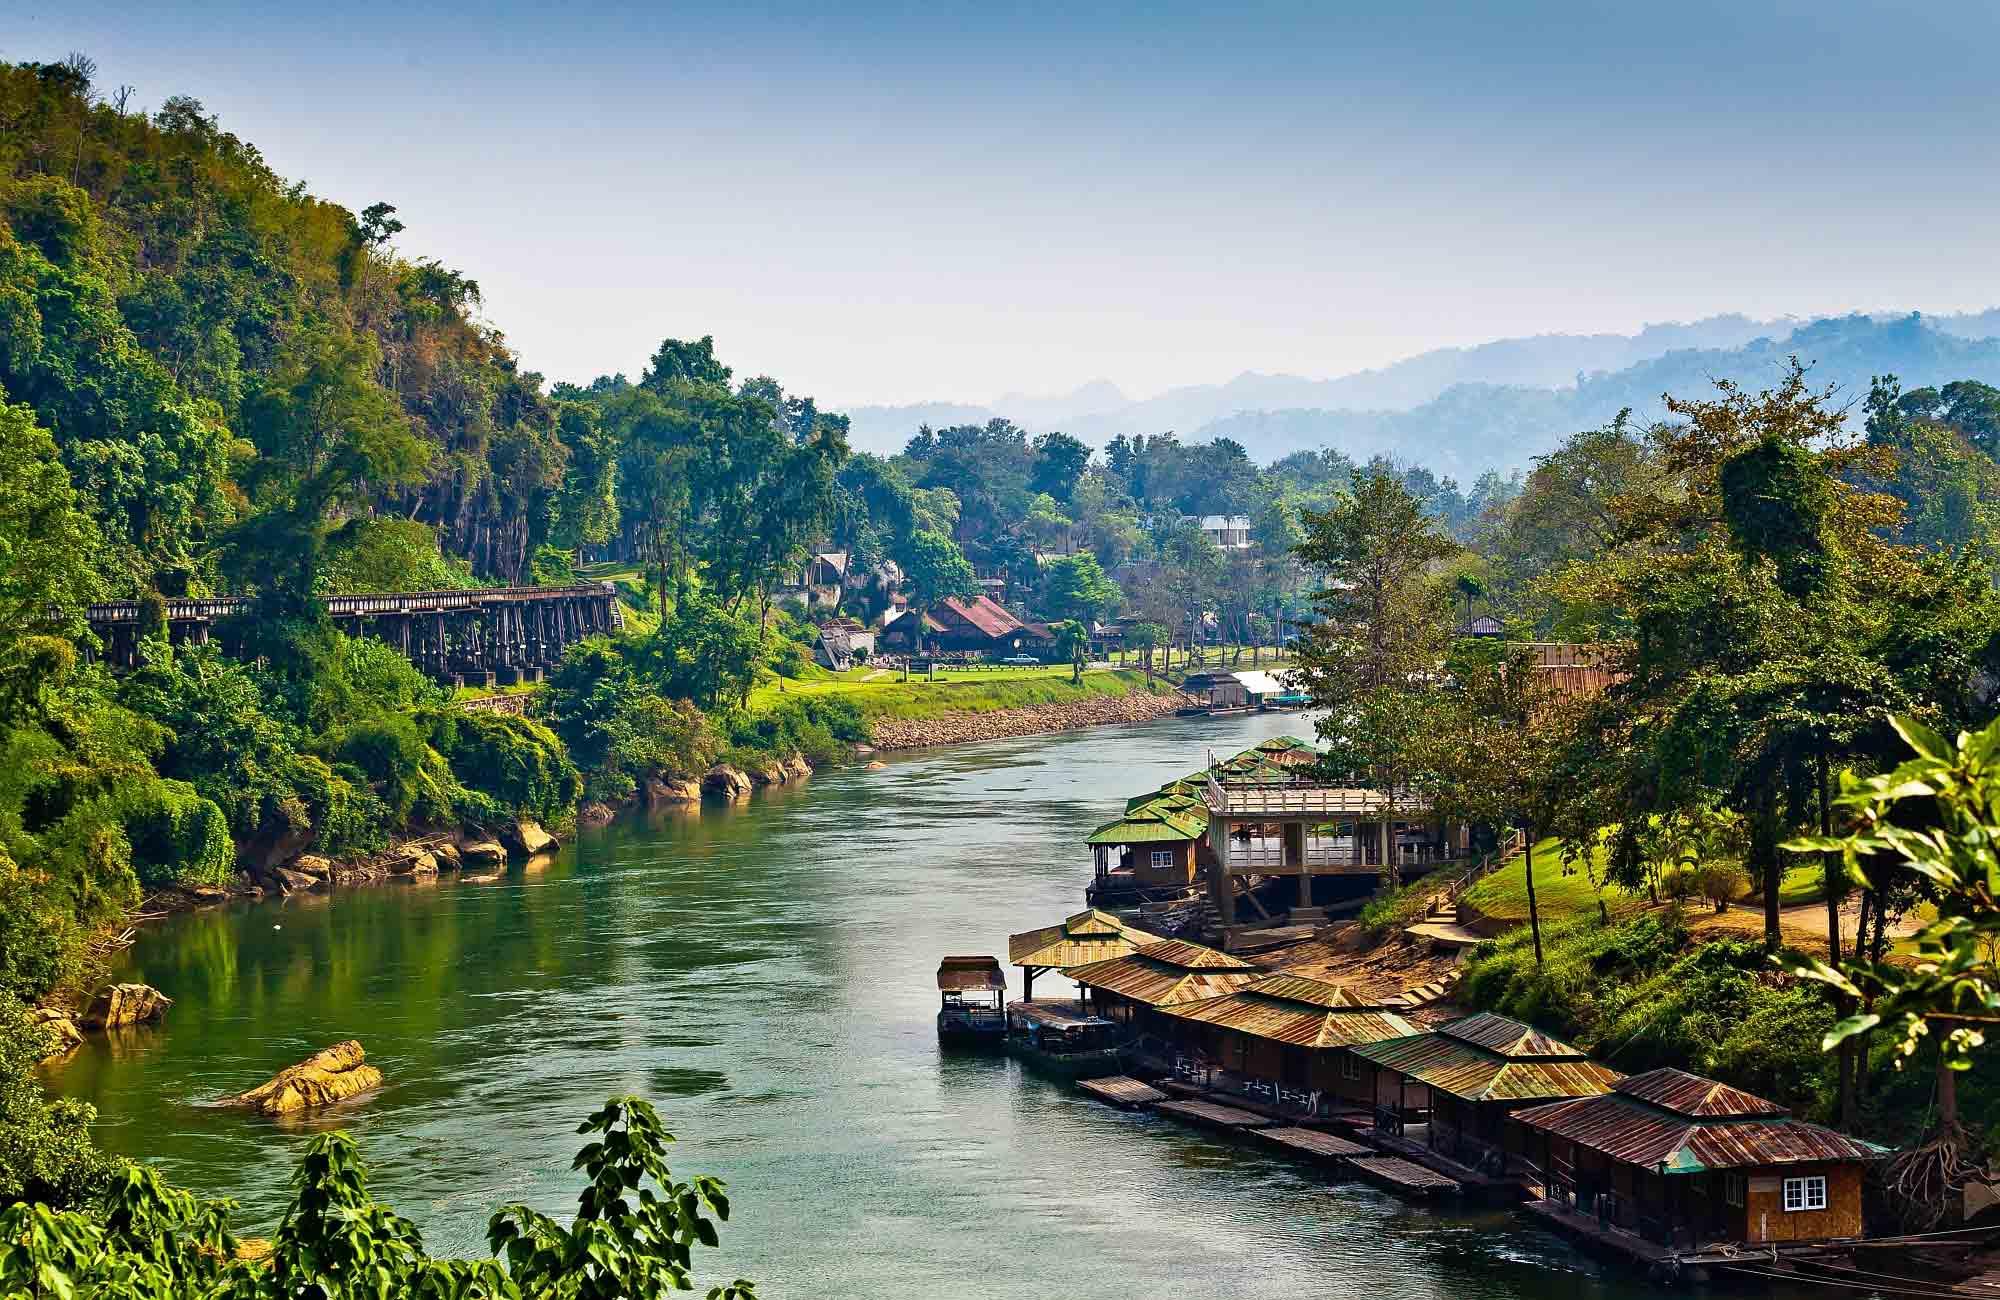 Voyage Thailande - Riviere Kwai province Kanchanaburi - Amplitudes